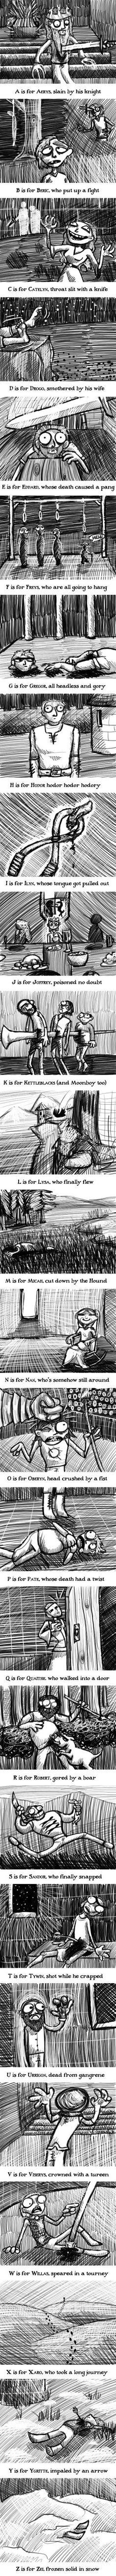 [All Spoilers] The GOT nursery rhyme